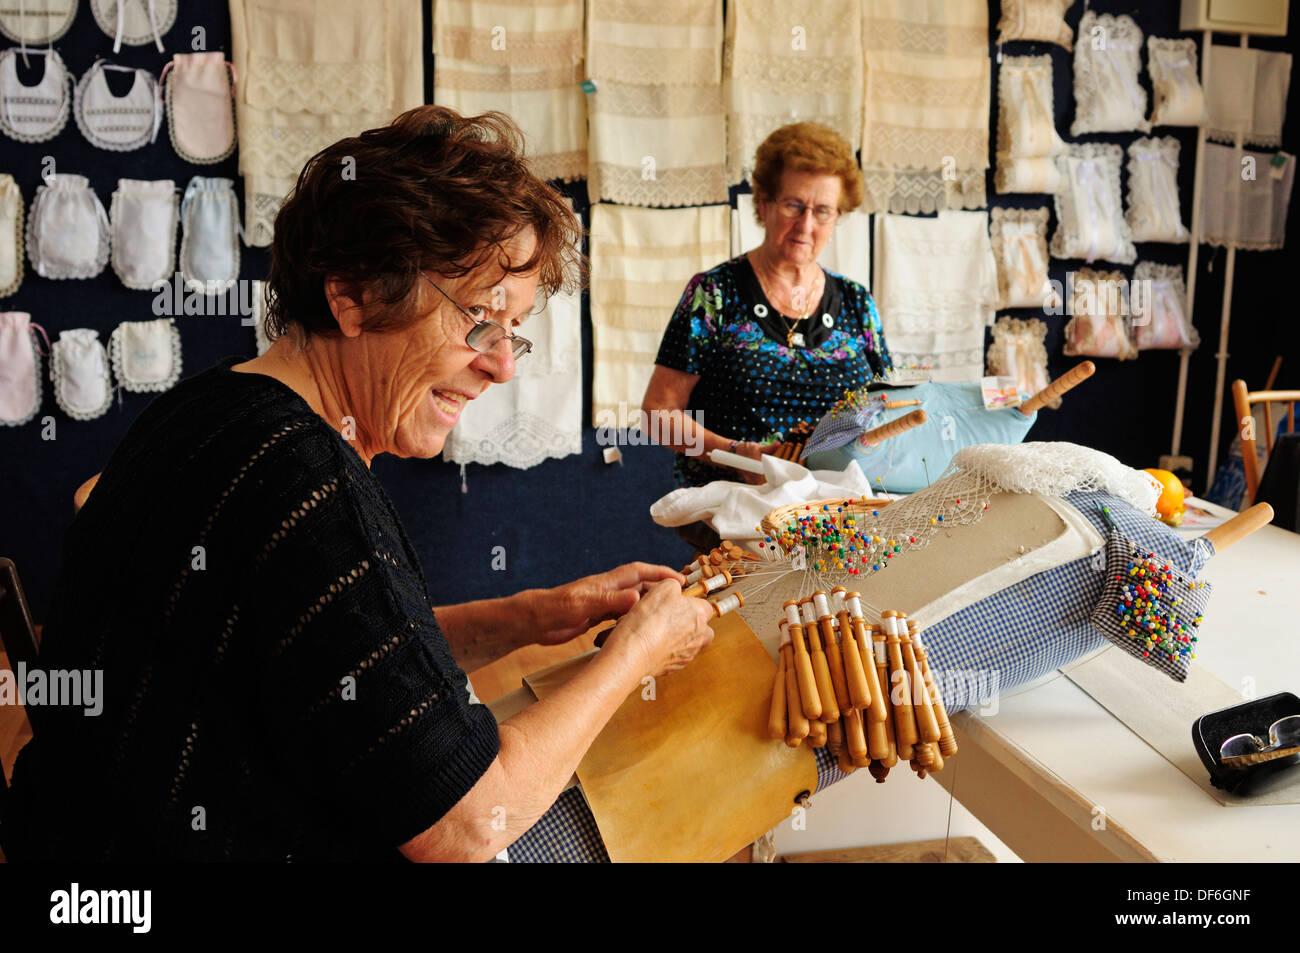 Artisan women of the Asociacion Palillada of bobbin lace, a symbolic weaving artwork of the village of Camariñas, Galicia, Spain - Stock Image